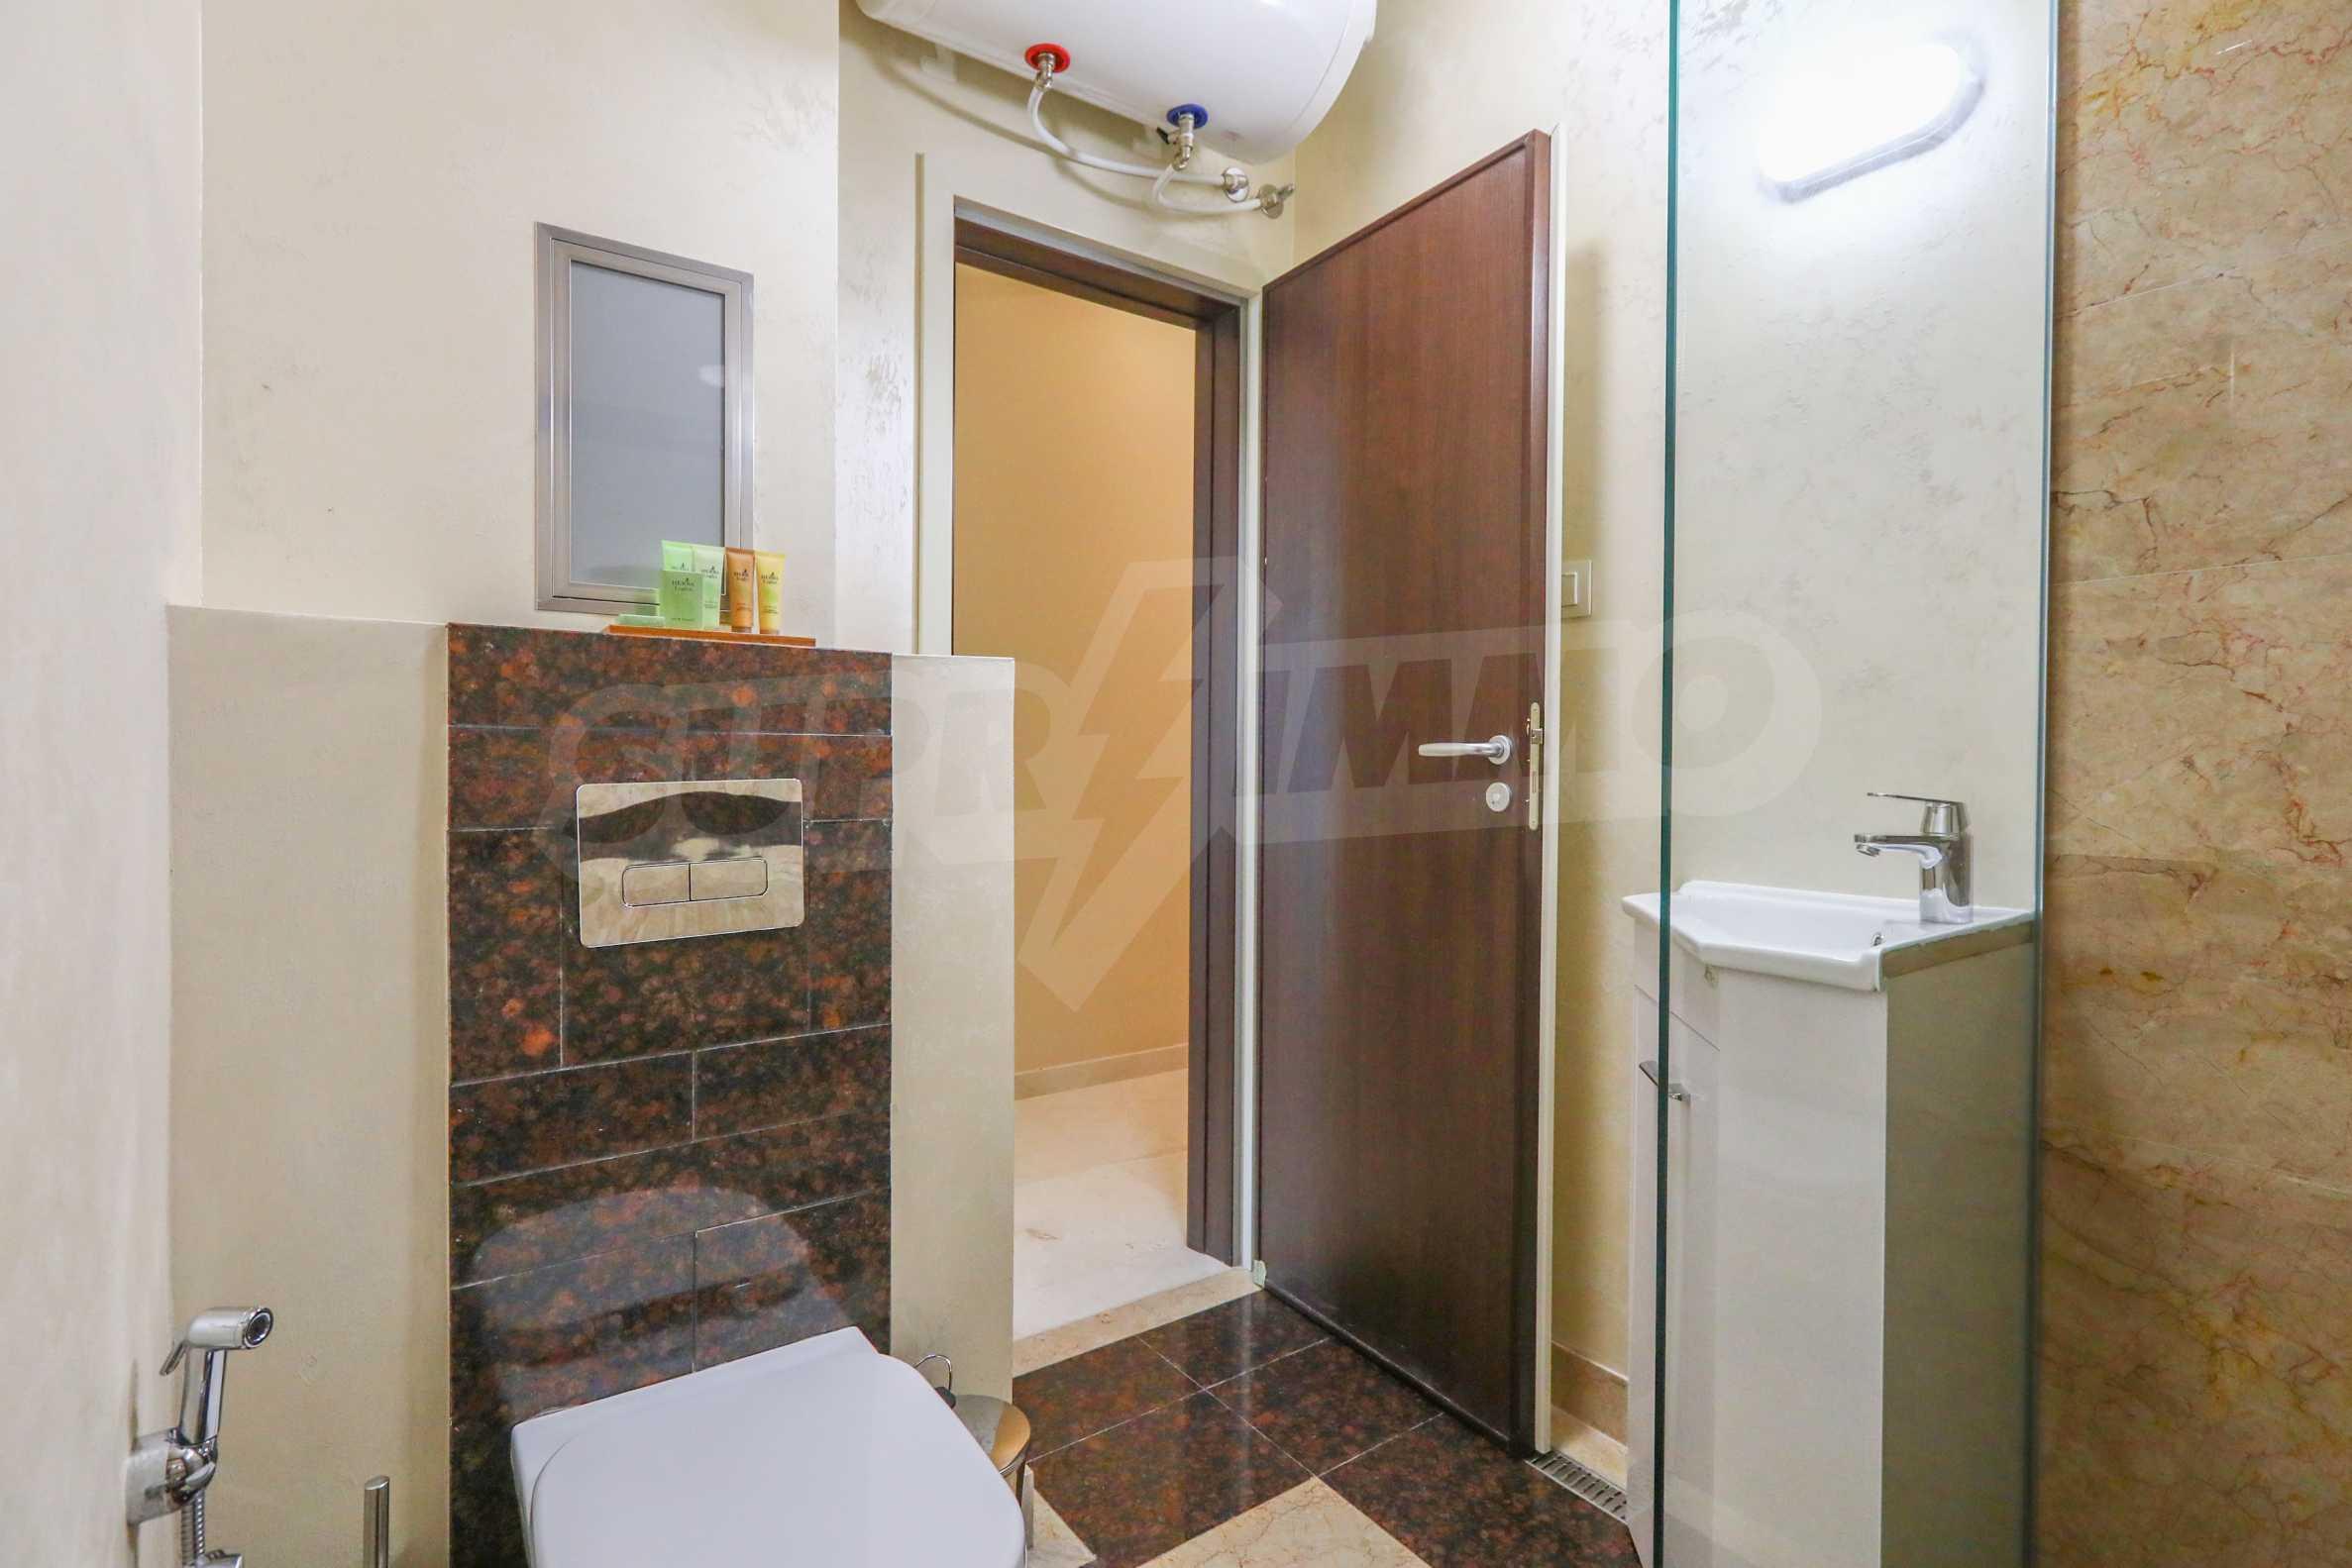 Комфортен двустаен апартамент под наем в Belle Époque Beach Residence, курорт Лозенец 18